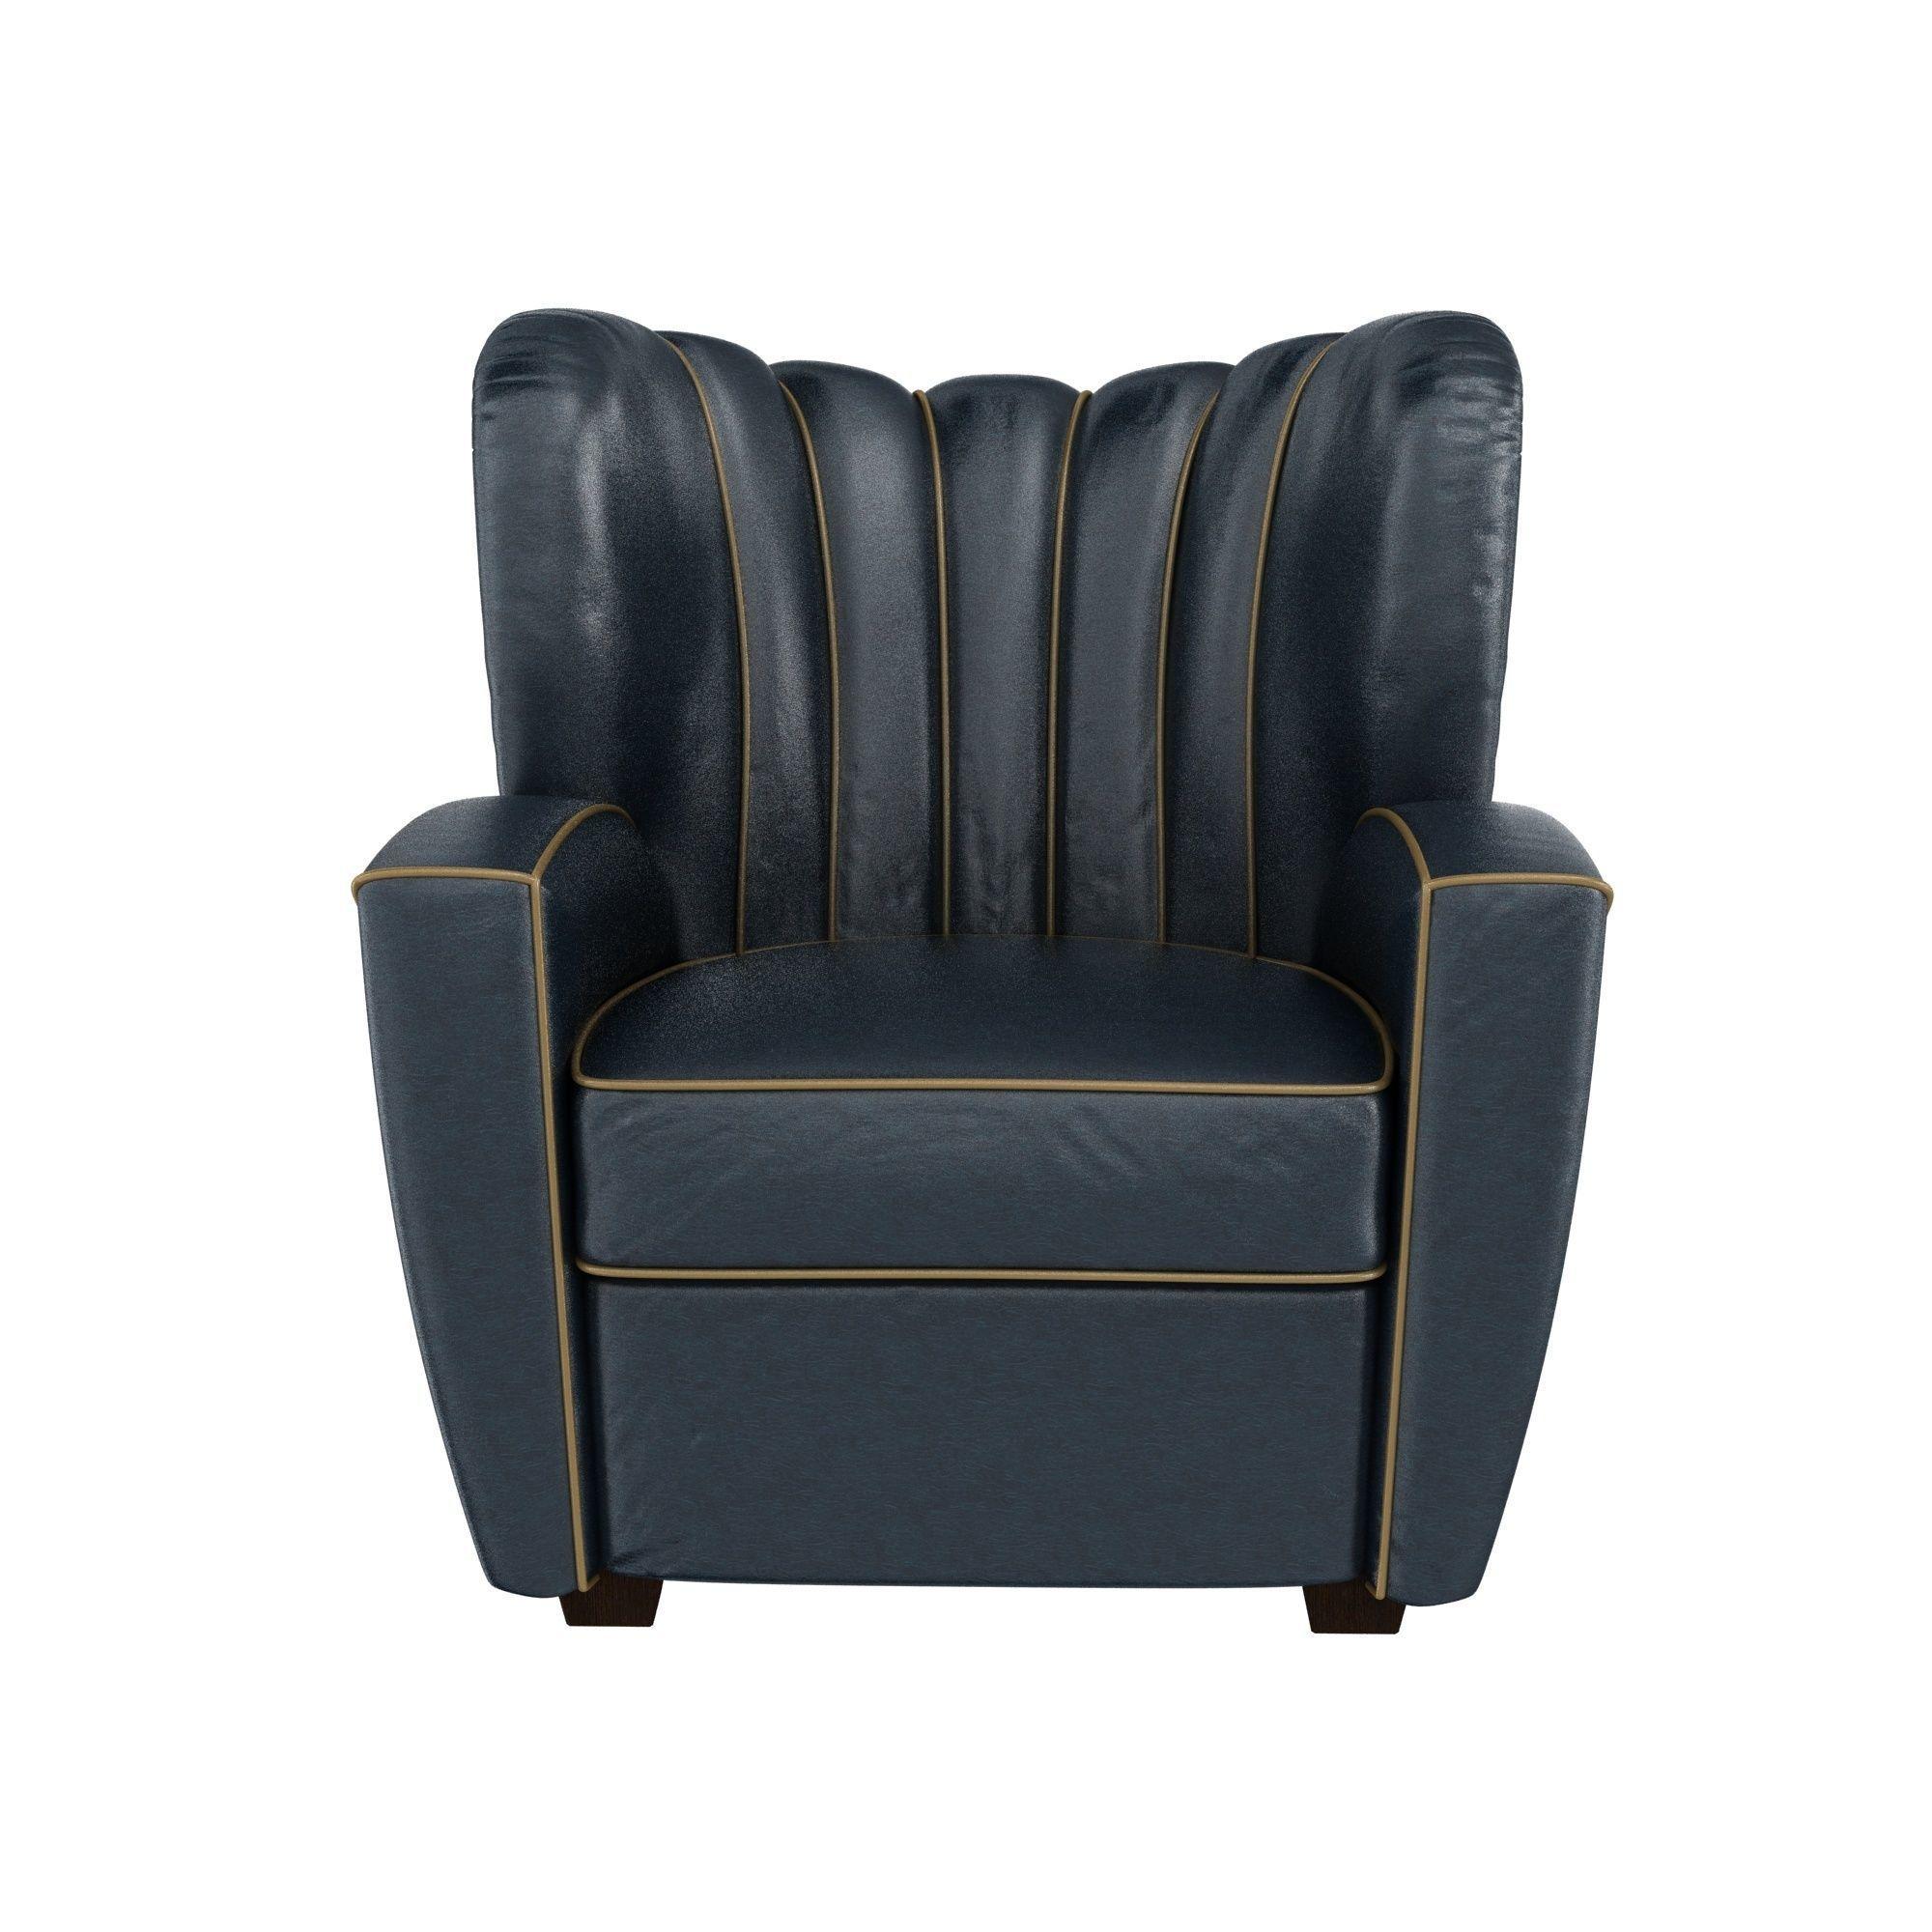 Beau Zarina Black Leather Armchair By Cesare Cassina For Adele 3D Model